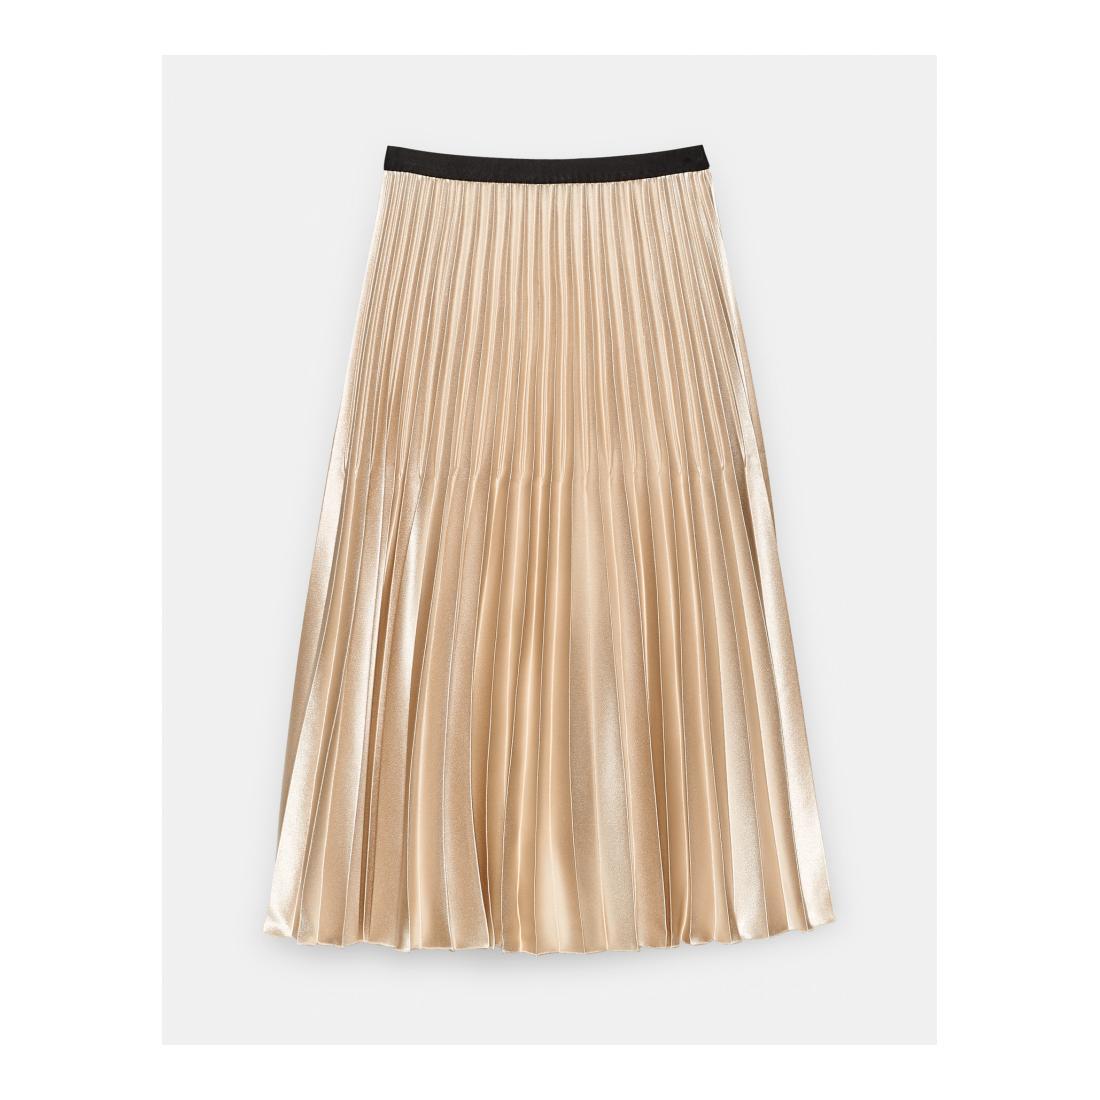 Someday Röcke normal Damen Onti shine